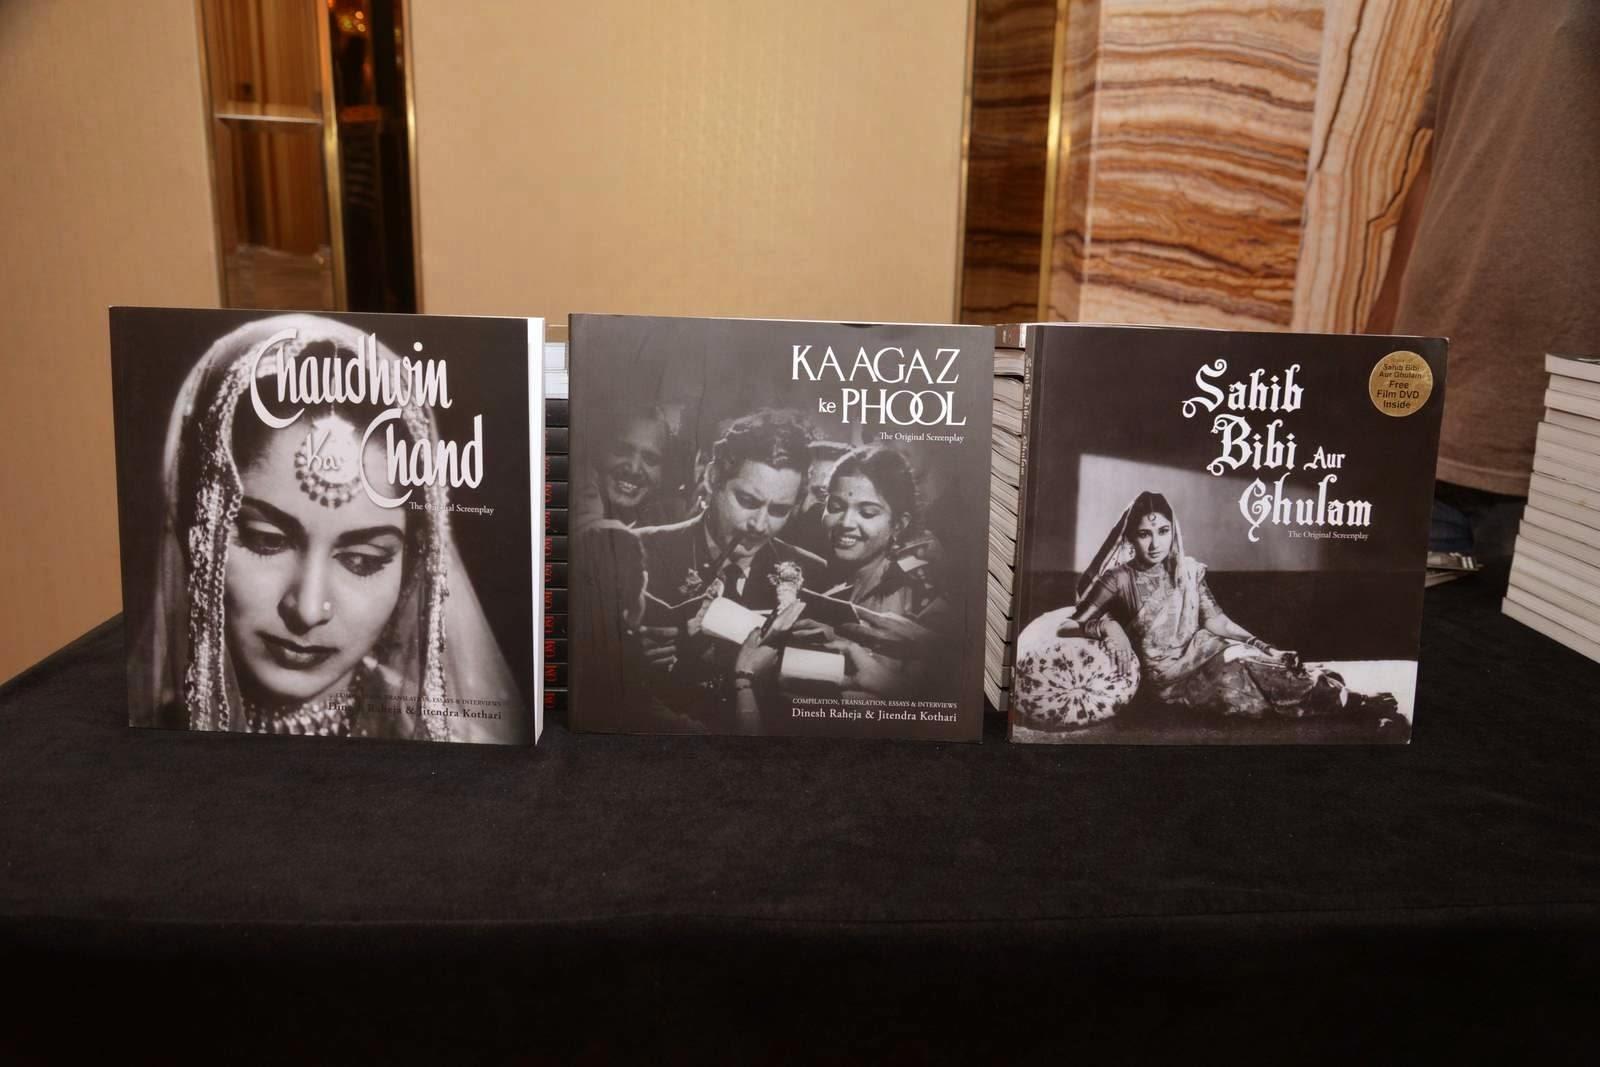 Farhan Akhtar & Vidhu Vinod Chopra at Guru Dutt's screenplay's book launch